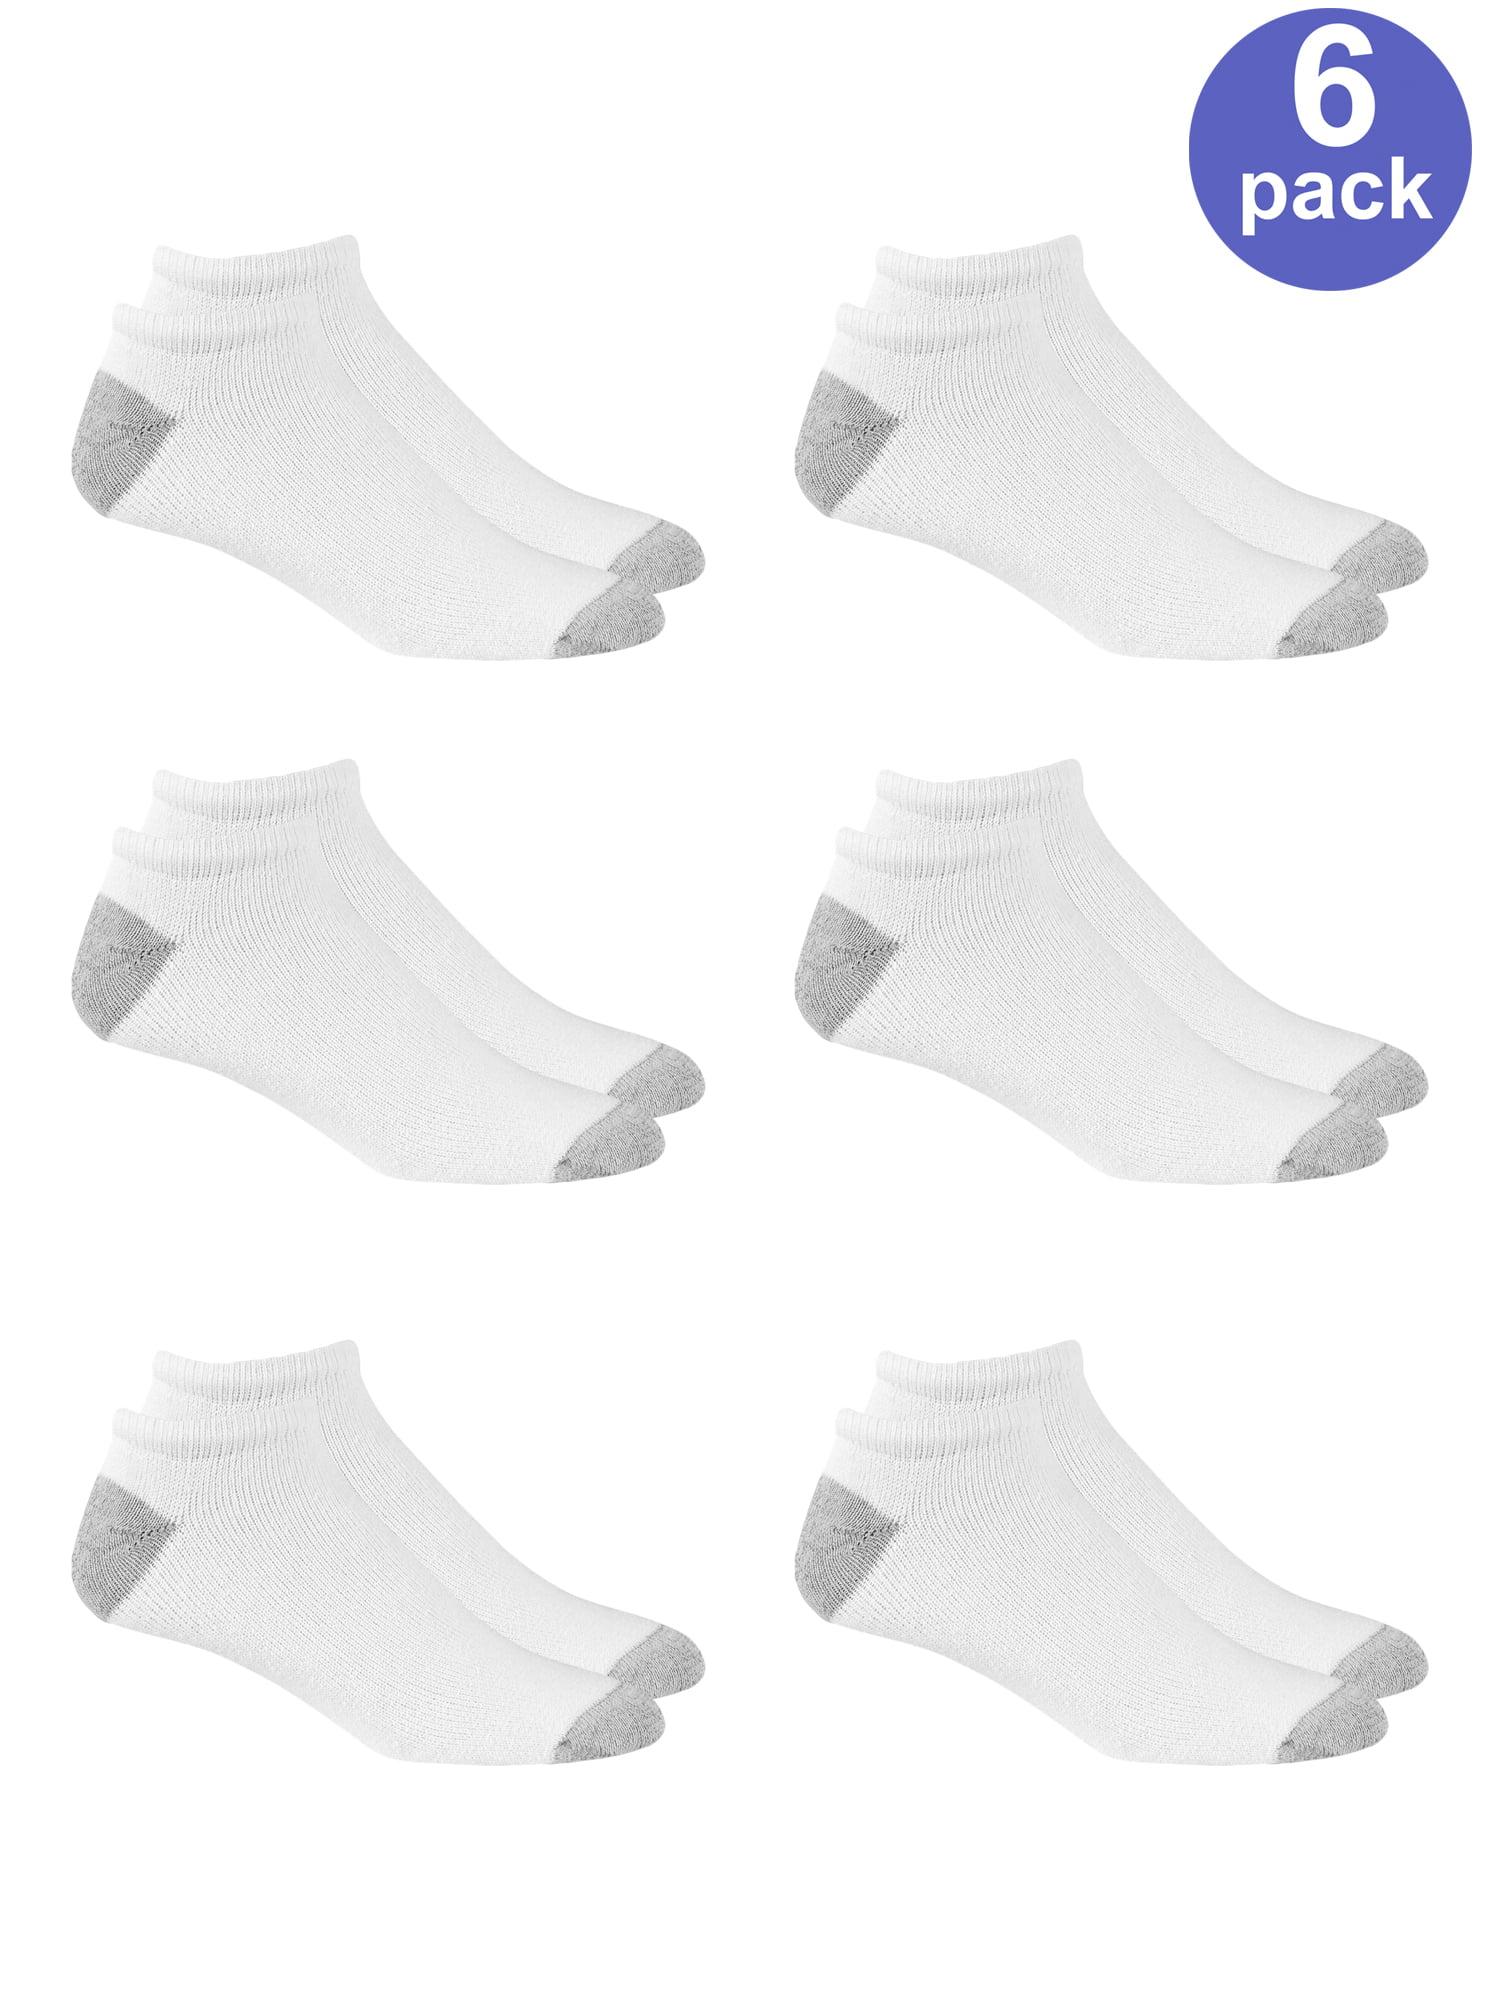 Kold Feet Mens Athletic 6-Pack Stripe Cushion Crew Hiking Performance Running Socks